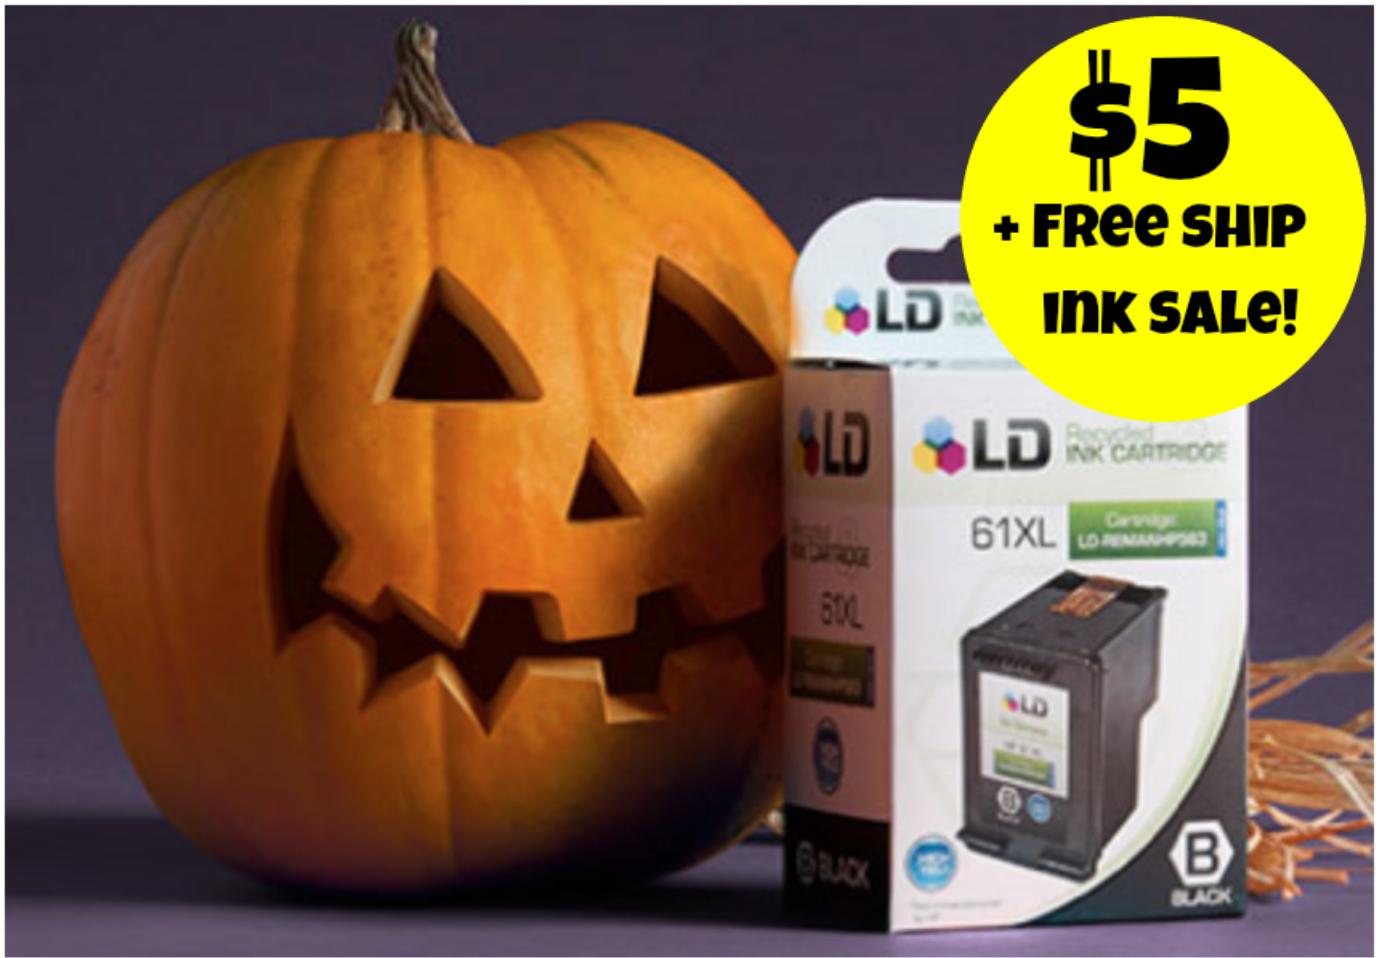 http://www.thebinderladies.com/2014/10/hot4inkjetscom-5-ink-cartridge-sale.html#.VFAGFr7dtbw